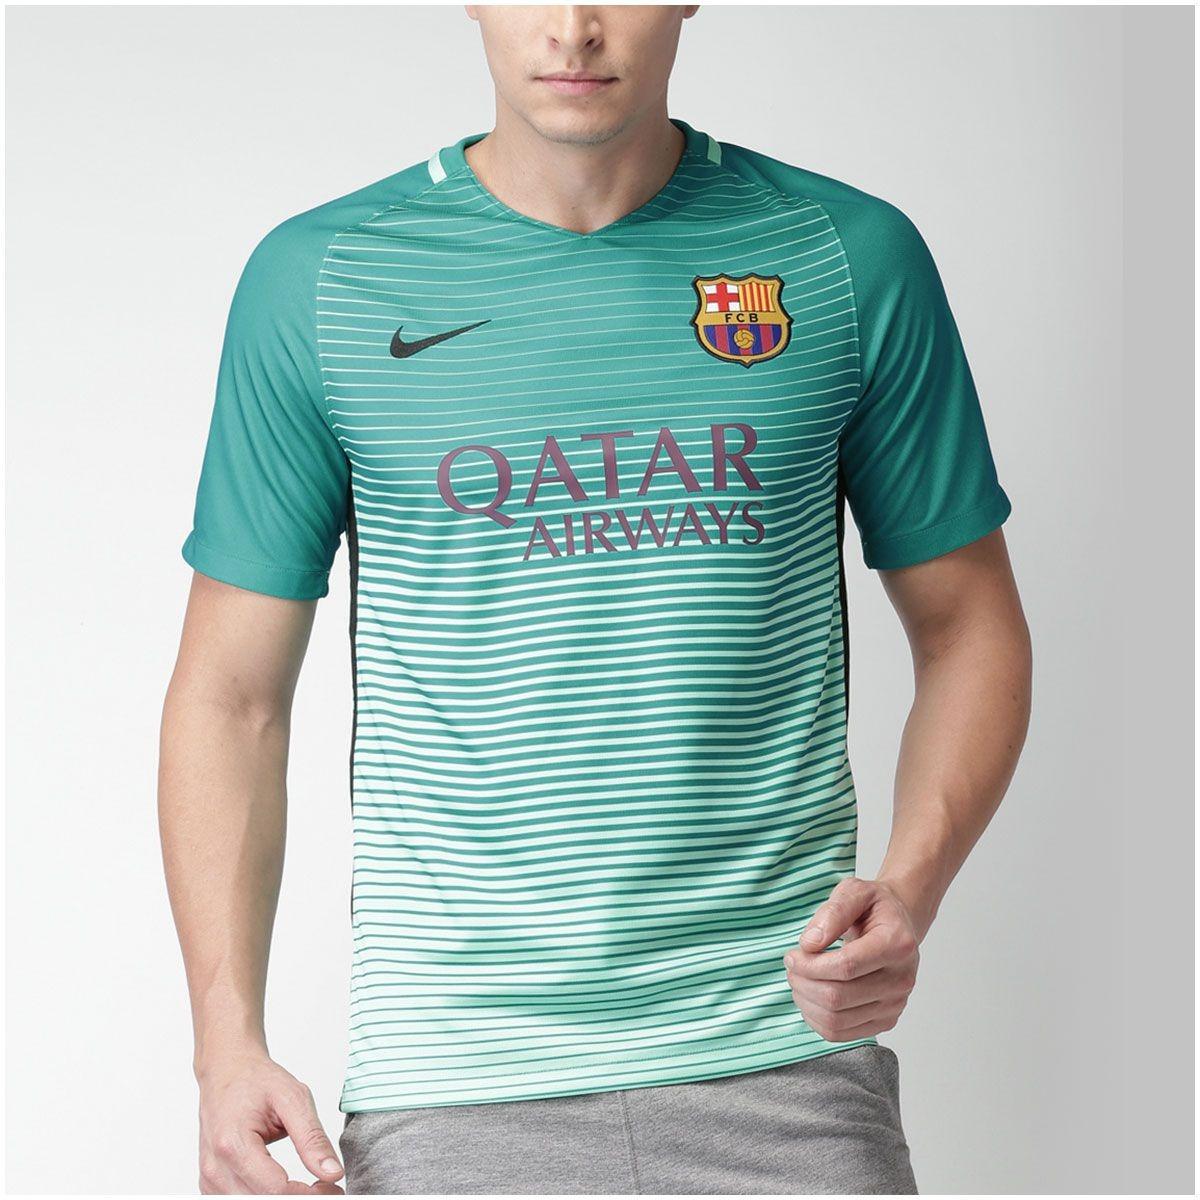 camisa barcelona iii 2016 2017. Carregando zoom. 6c732ed25750f